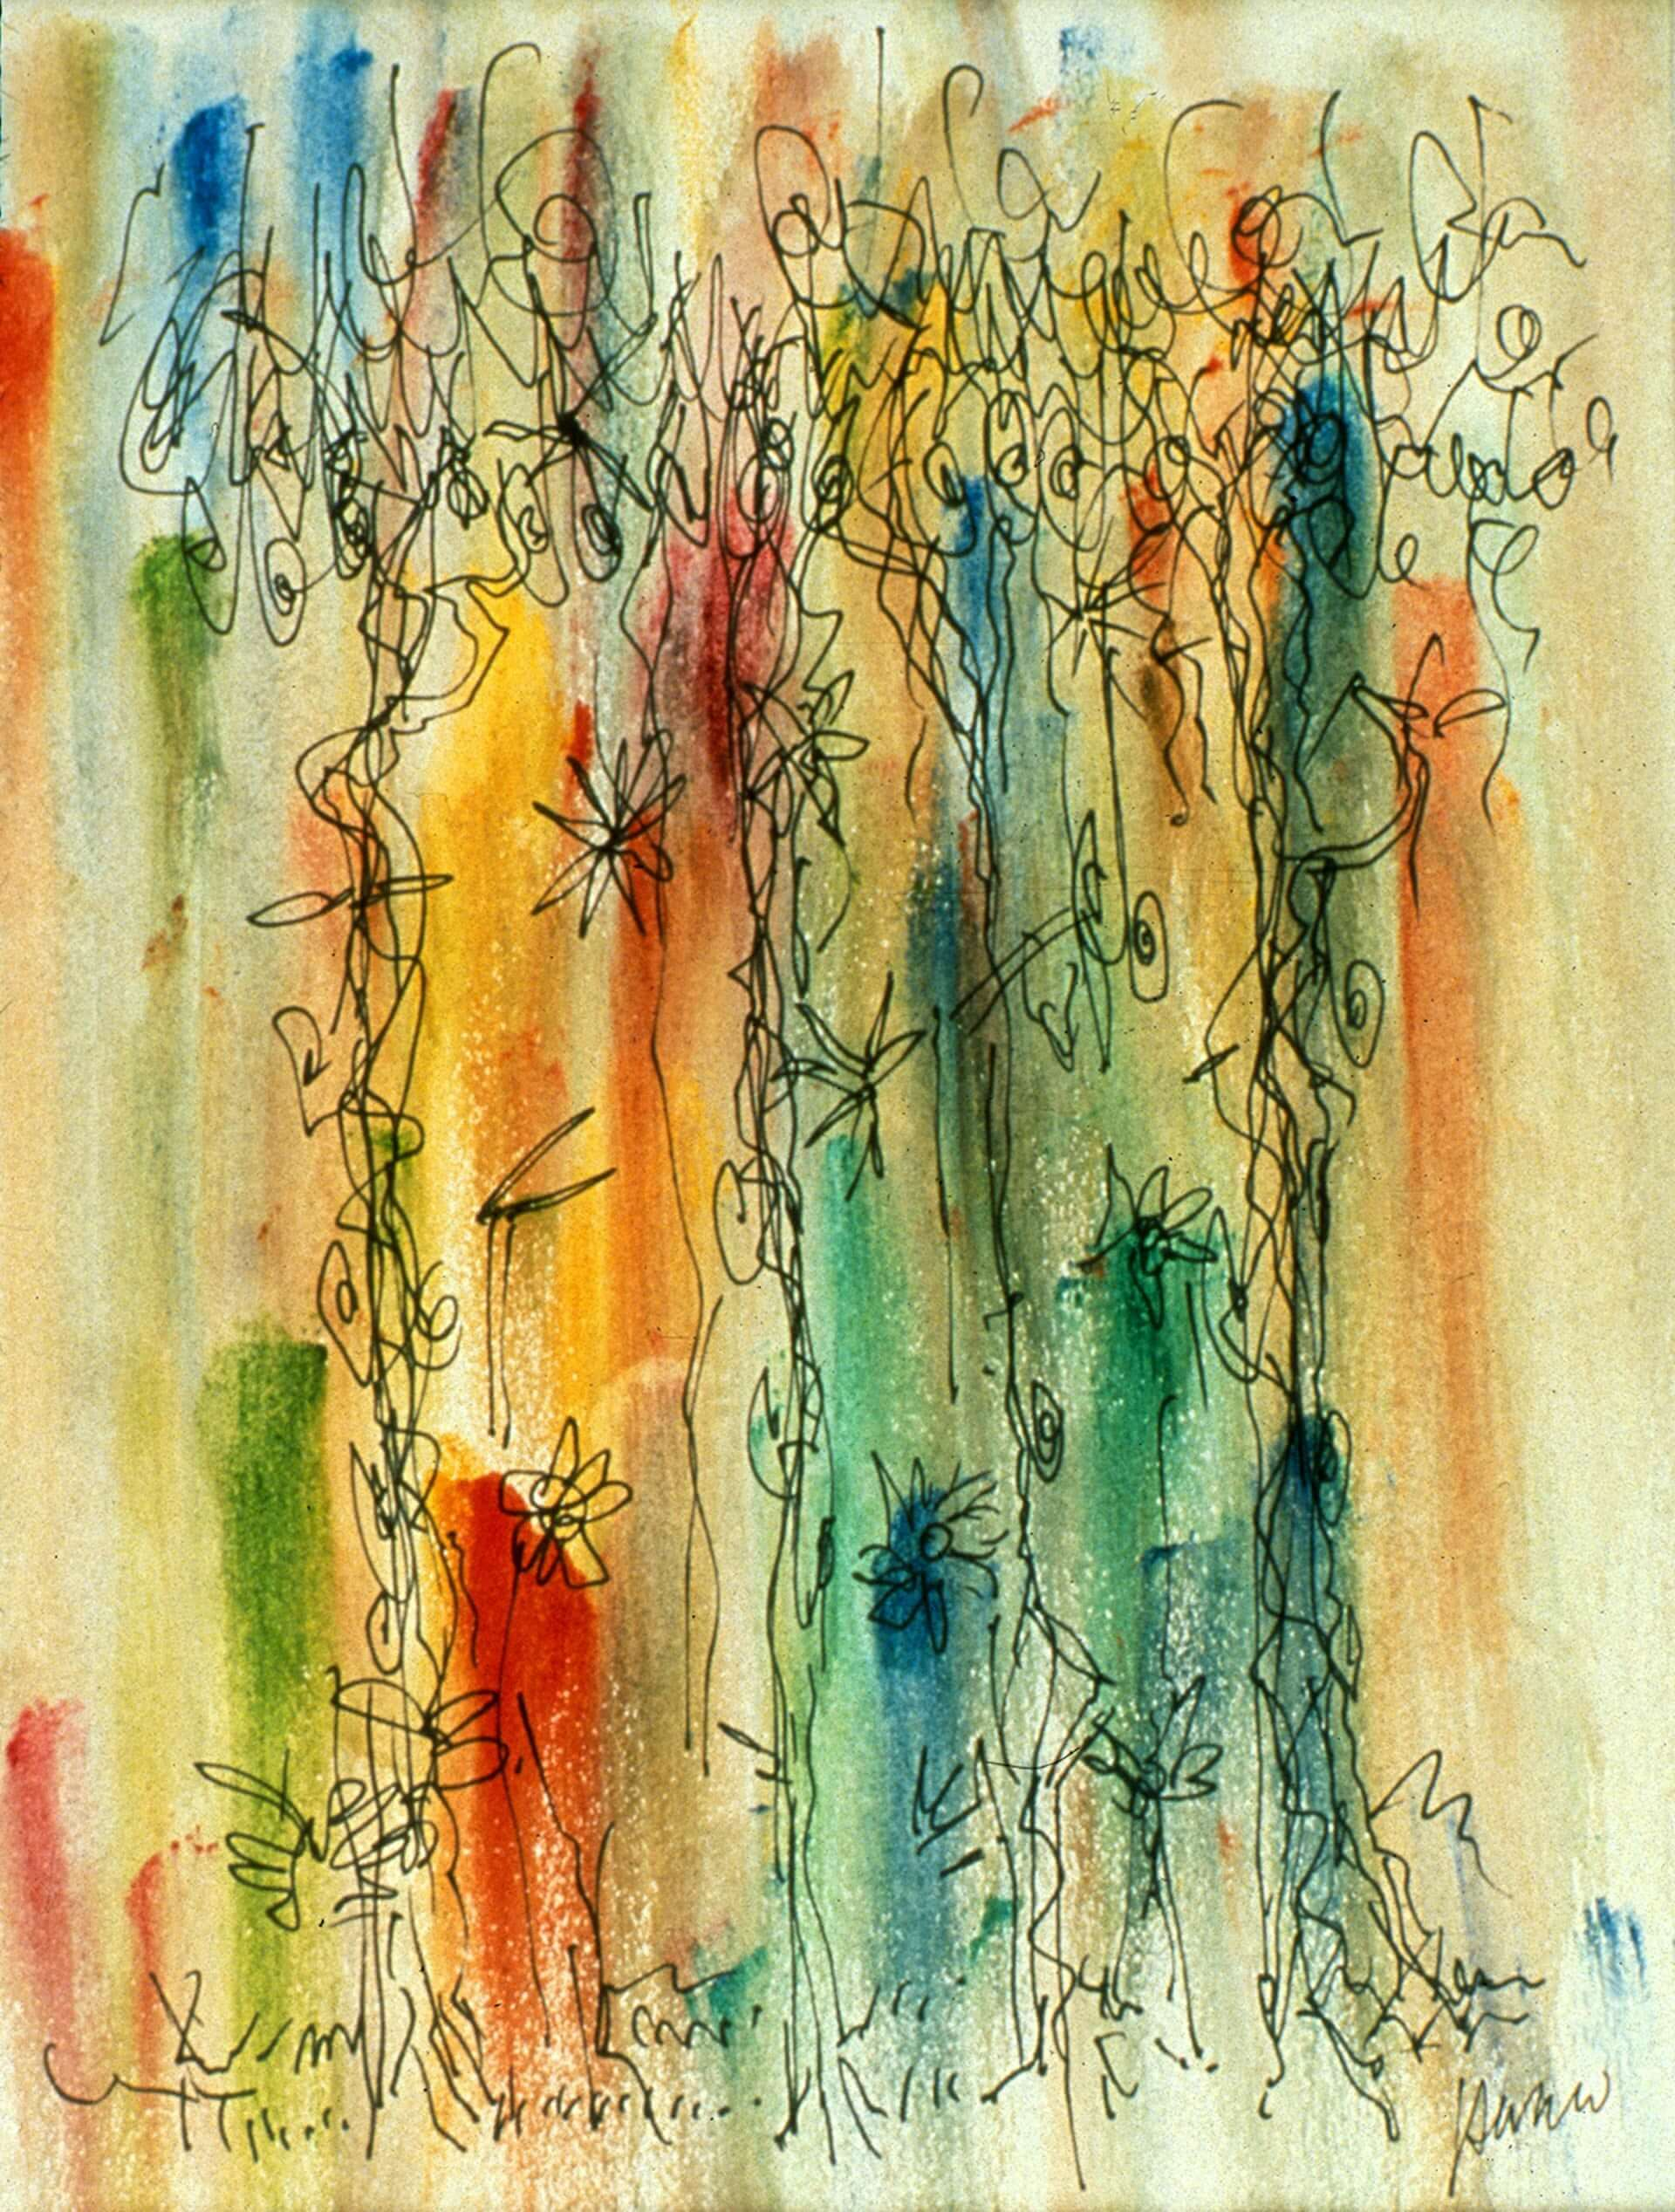 KEENが世界的アーティスト、ジェリー・ガルシアとのコラボアイテムを発売決定!アートワーク2作品をモチーフにしたシューズが登場 lf200730_keen-jerrygarcia_6-1920x2535